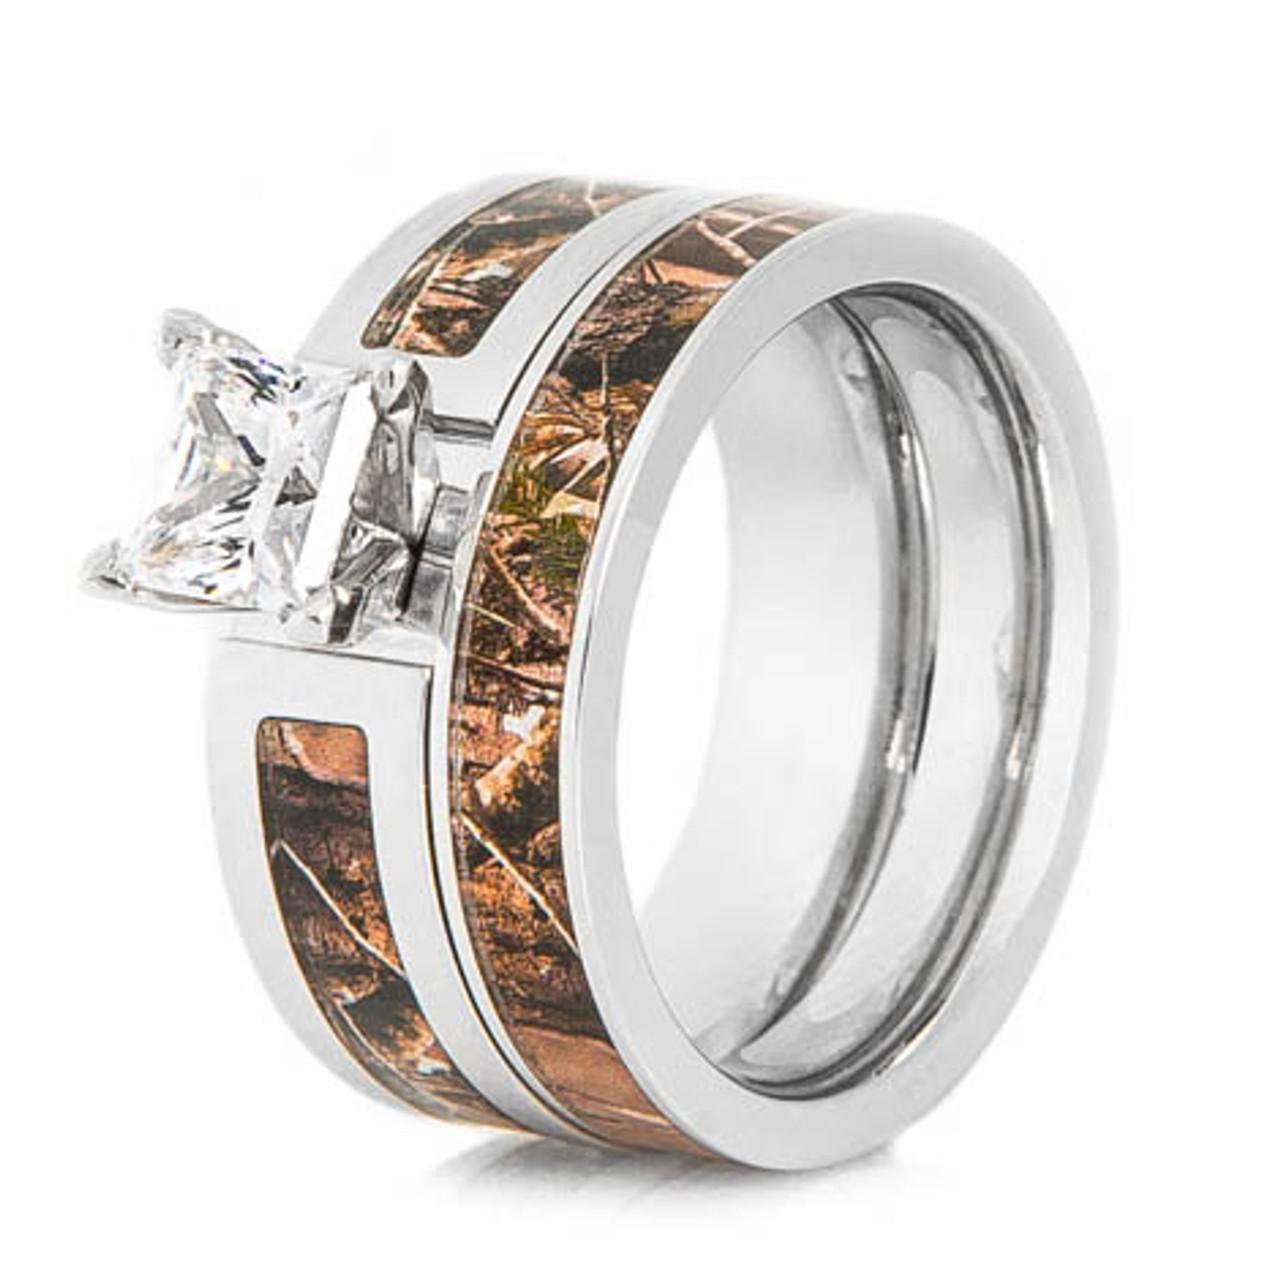 Wedding Ring Sets.Women S Cobalt Chrome Realtree Camo Wedding Ring Set